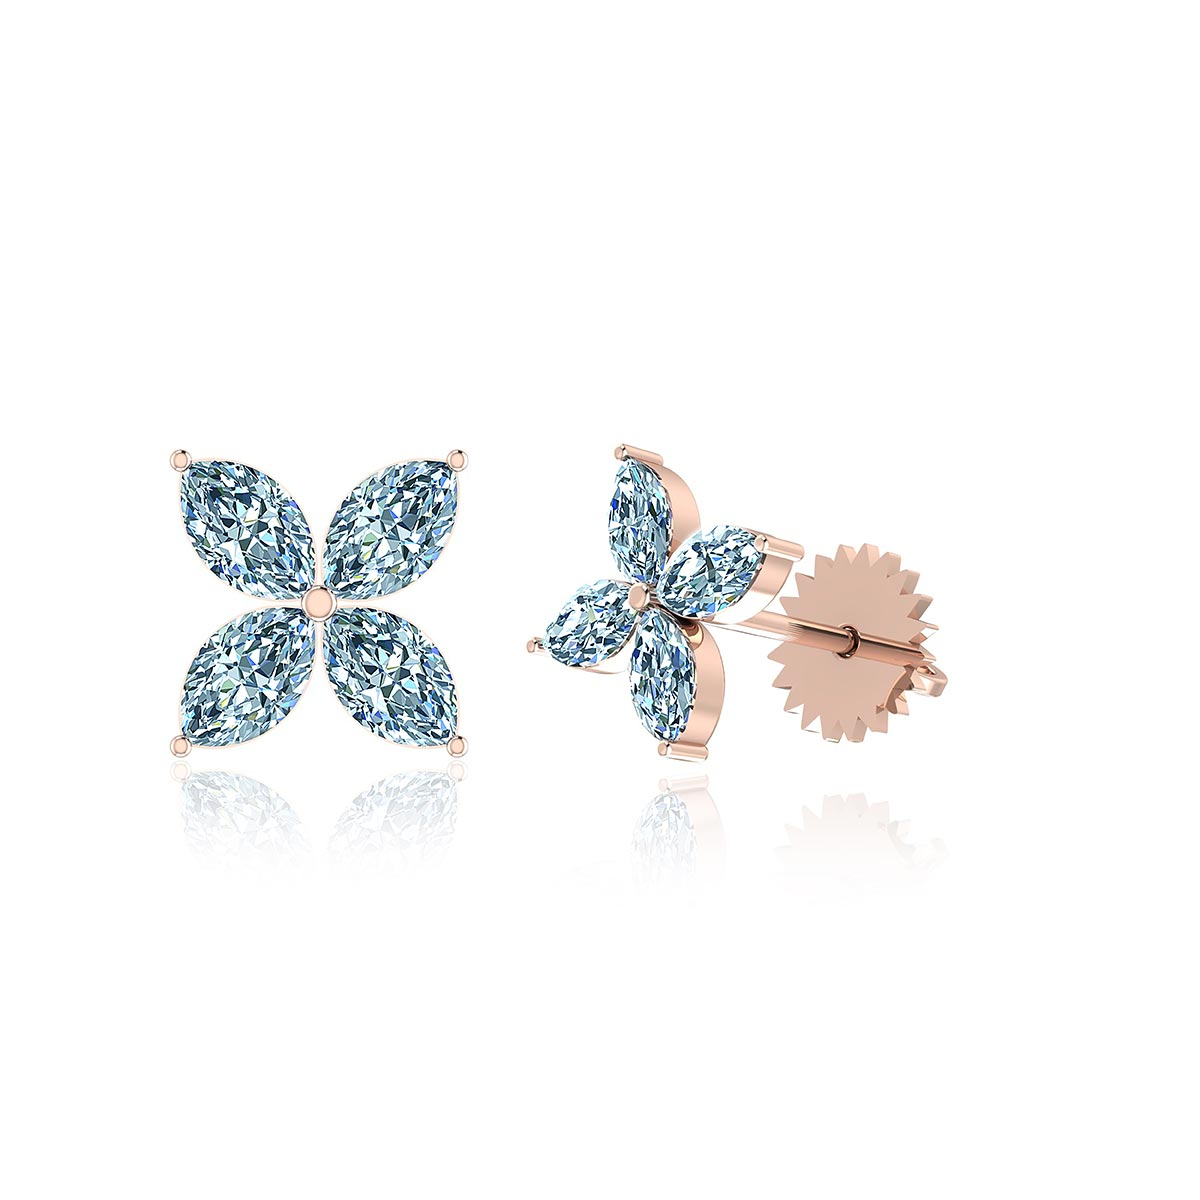 Star Gazer Cluster Diamond Earrings (2 1/2 CT. TW.)